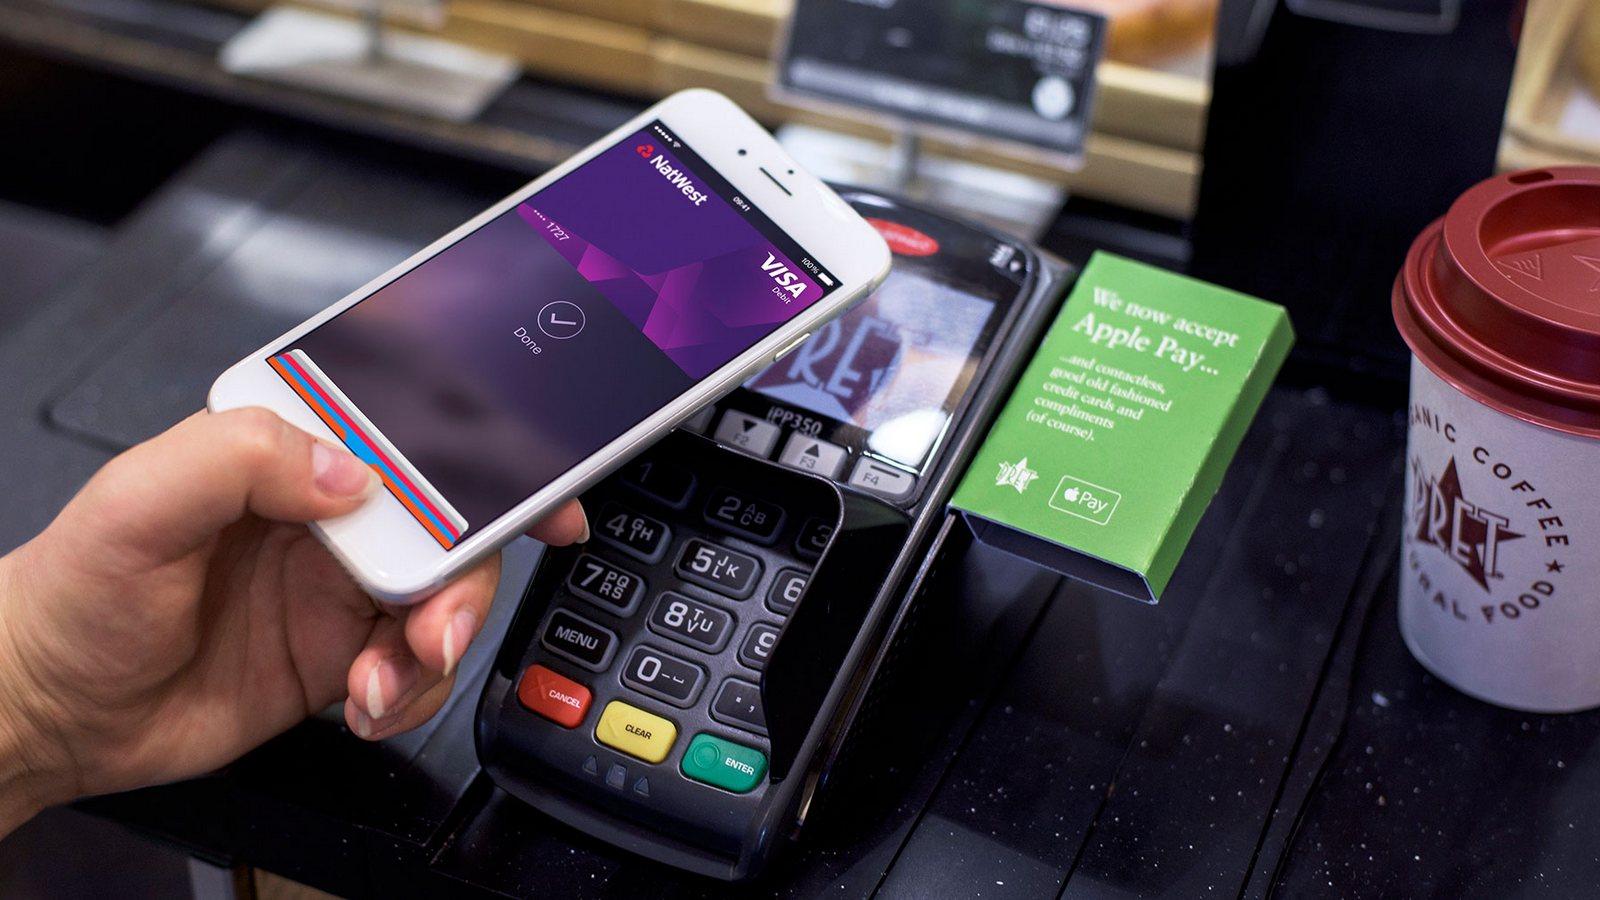 Работает ли Apple Pay и NFC на iPhone 5s